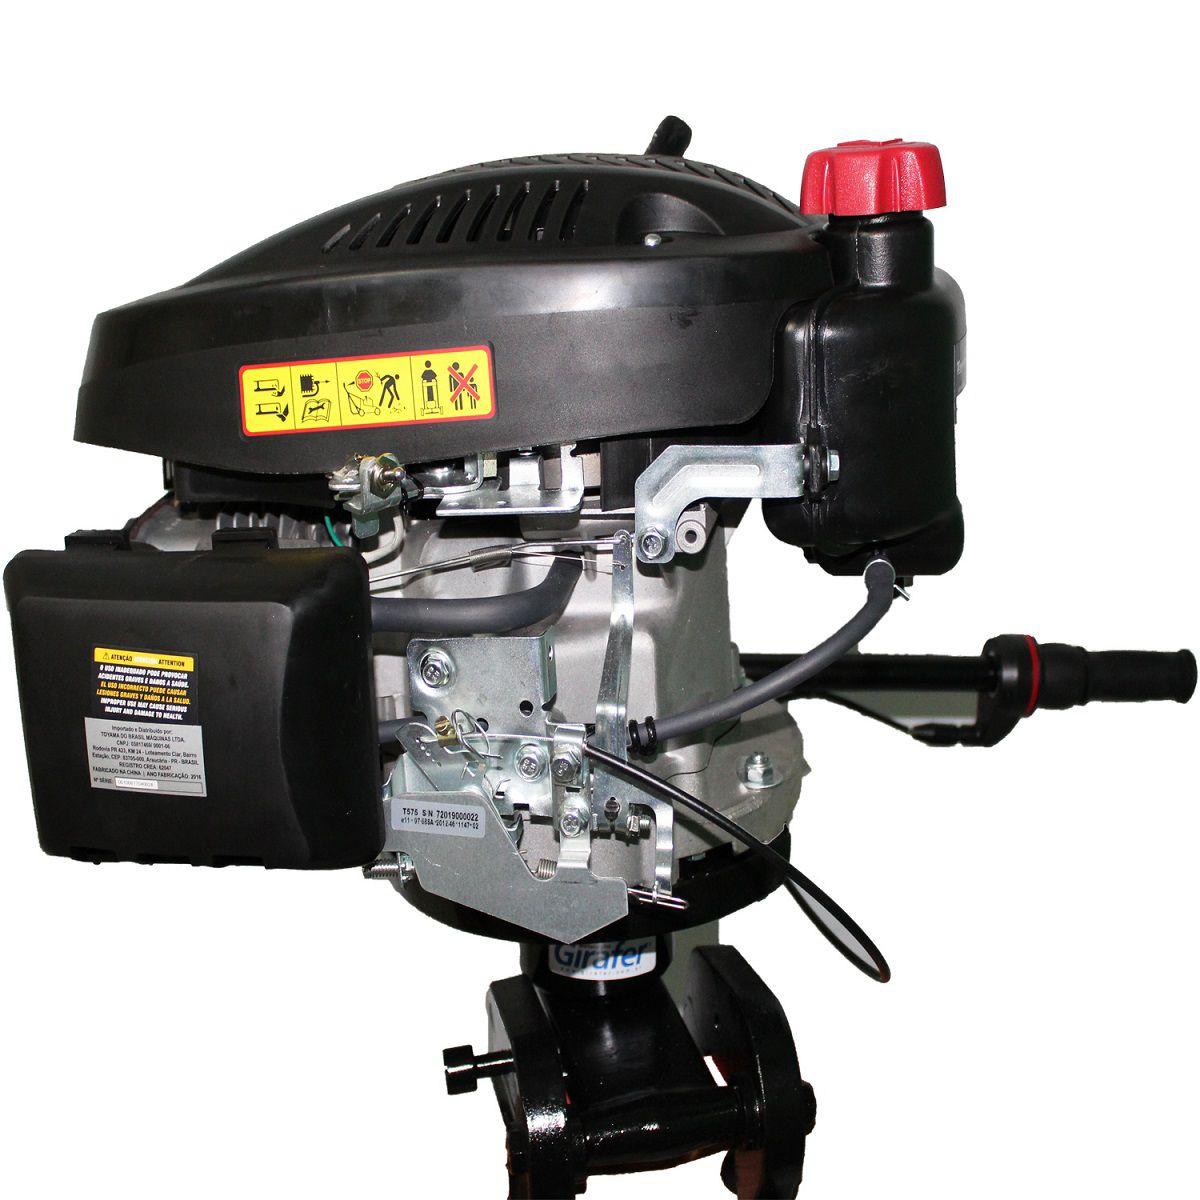 Motor Barco Rabeta 5.75HP 173CC 4 Tempos Gasolina Toyama